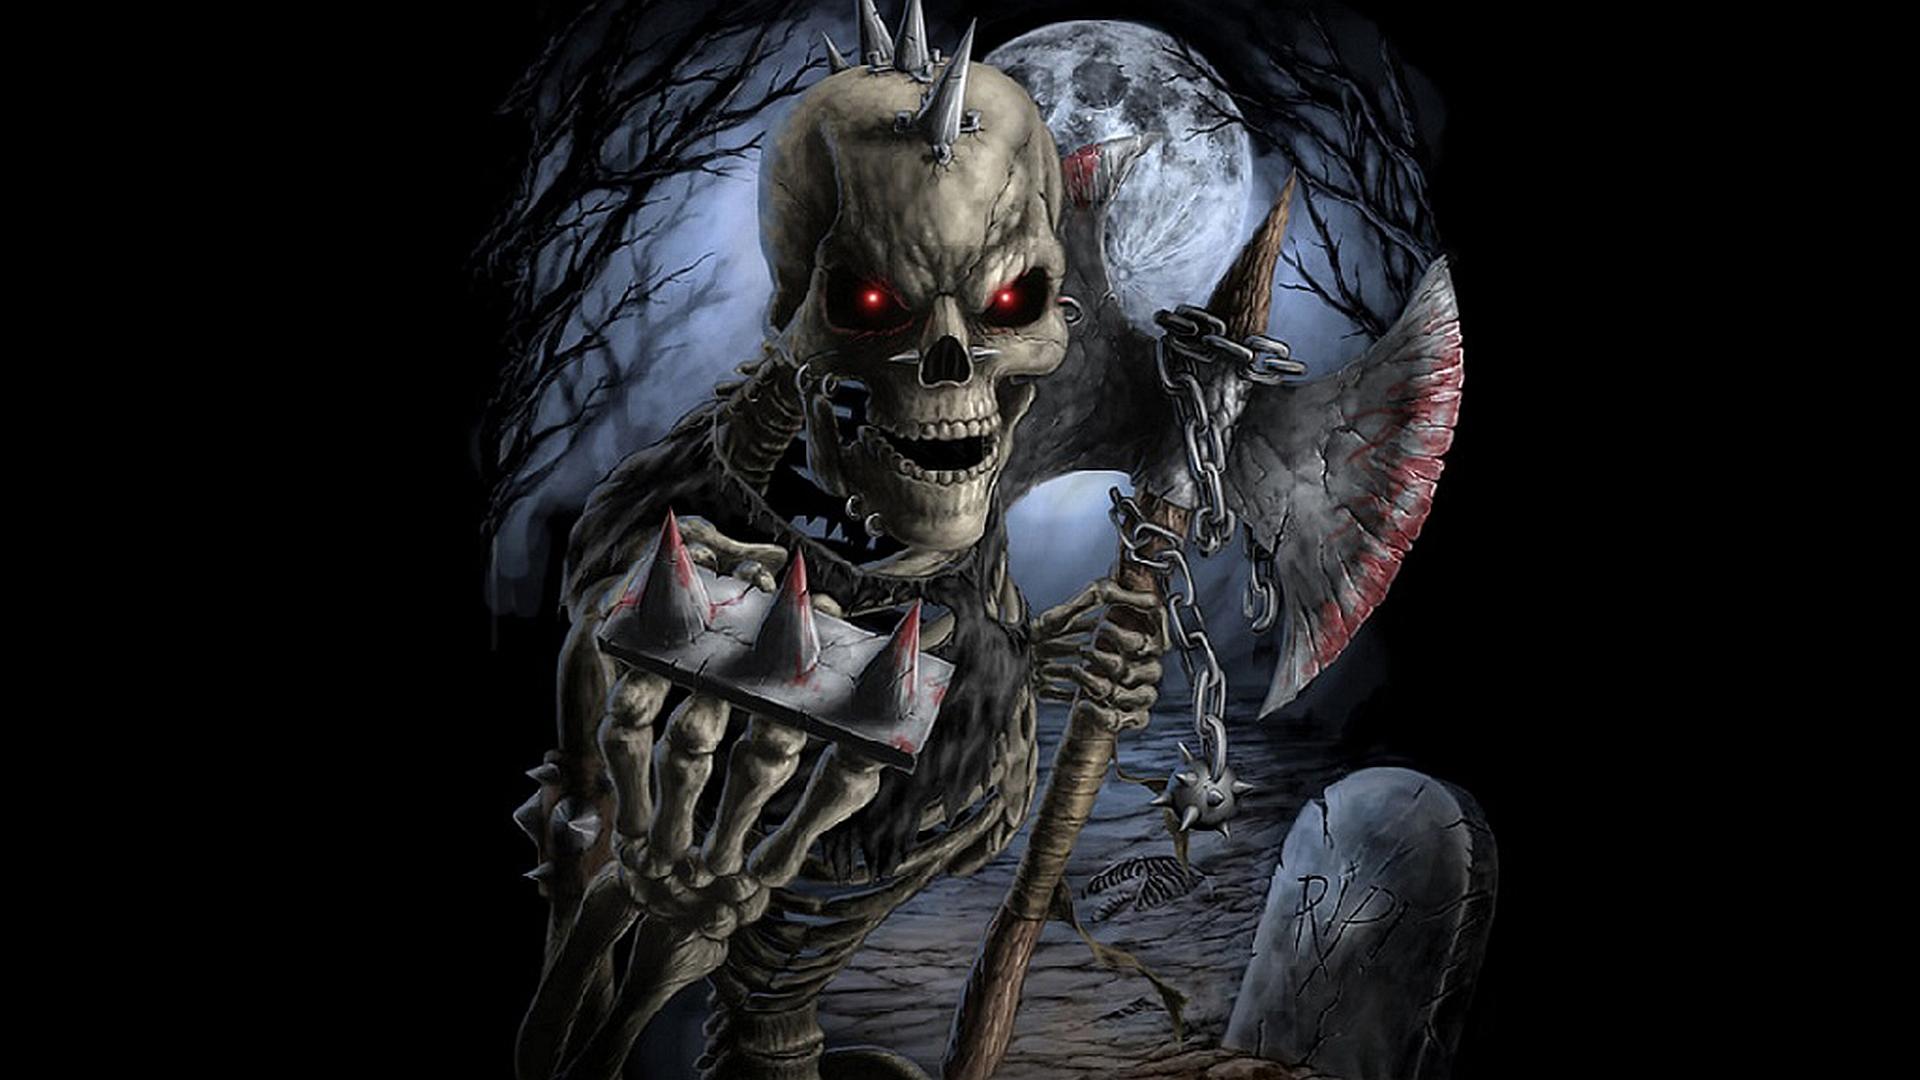 Warrior full hd wallpaper and background image 1920x1080 id168987 dark warrior dark skeleton tombstone axe moon wallpaper voltagebd Gallery